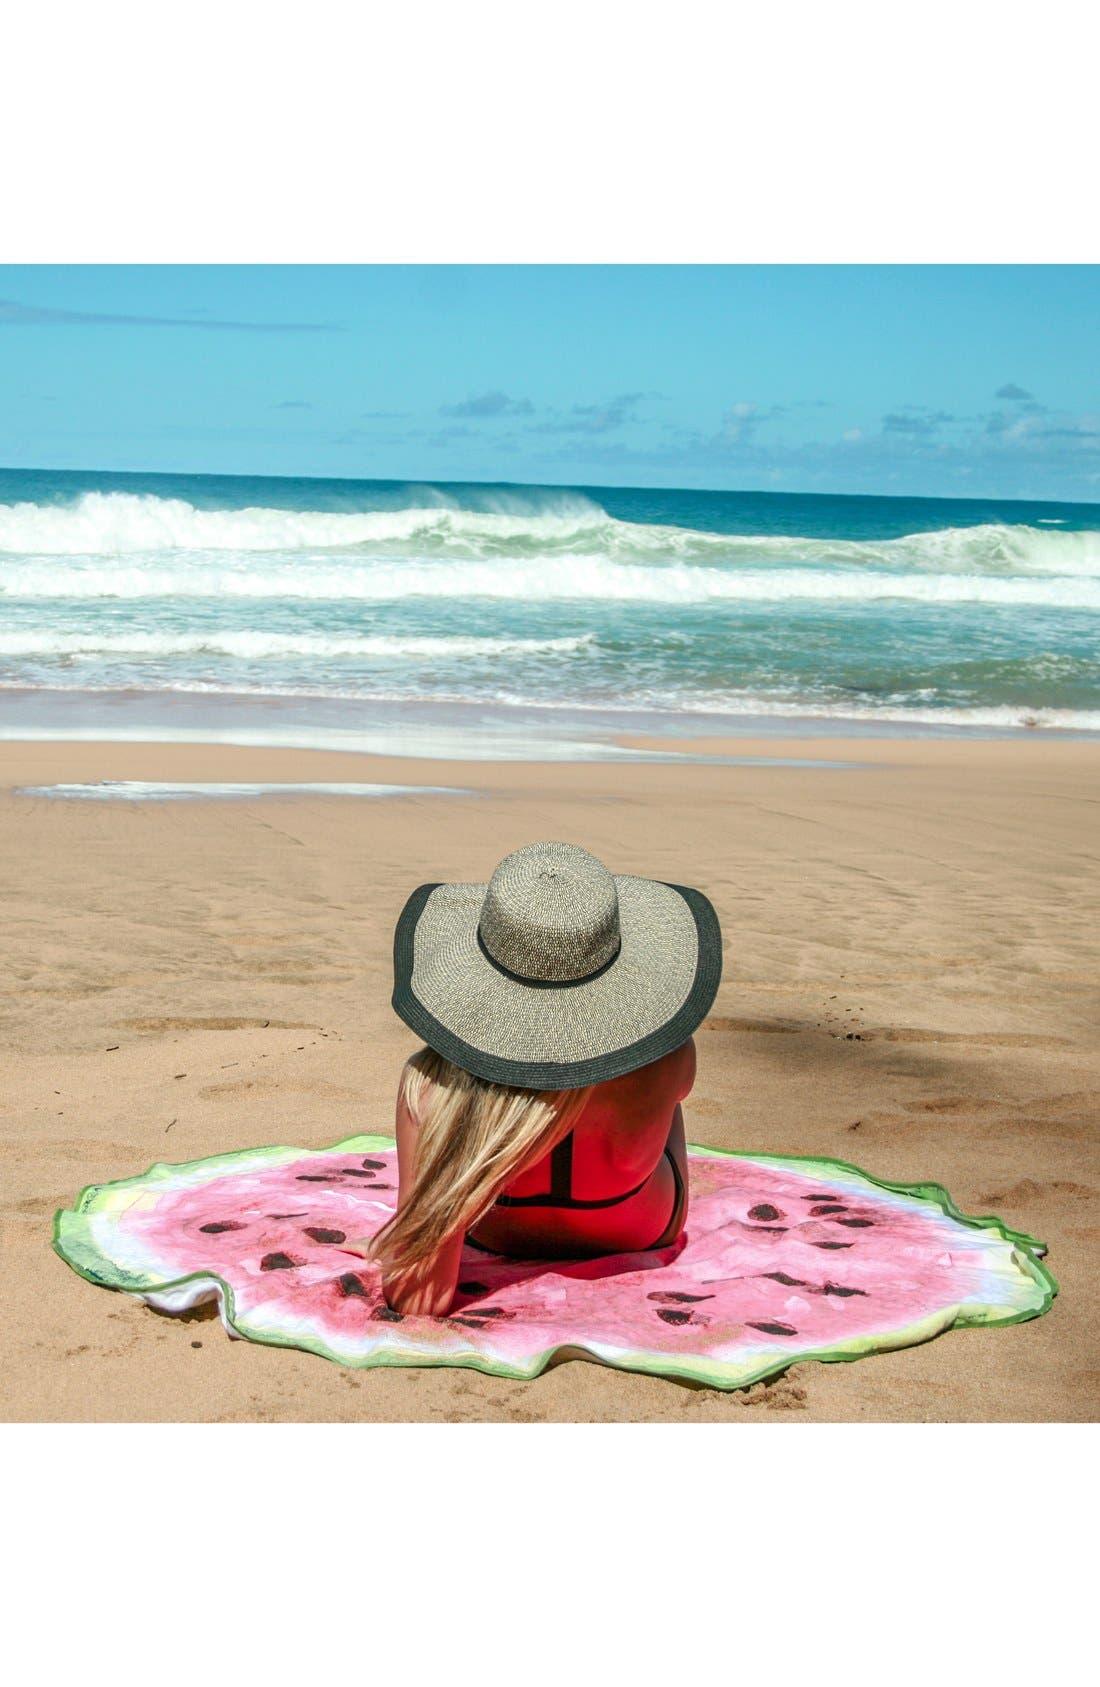 Alternate Image 3  - Round Towel Co. Watermelon Round Beach Towel